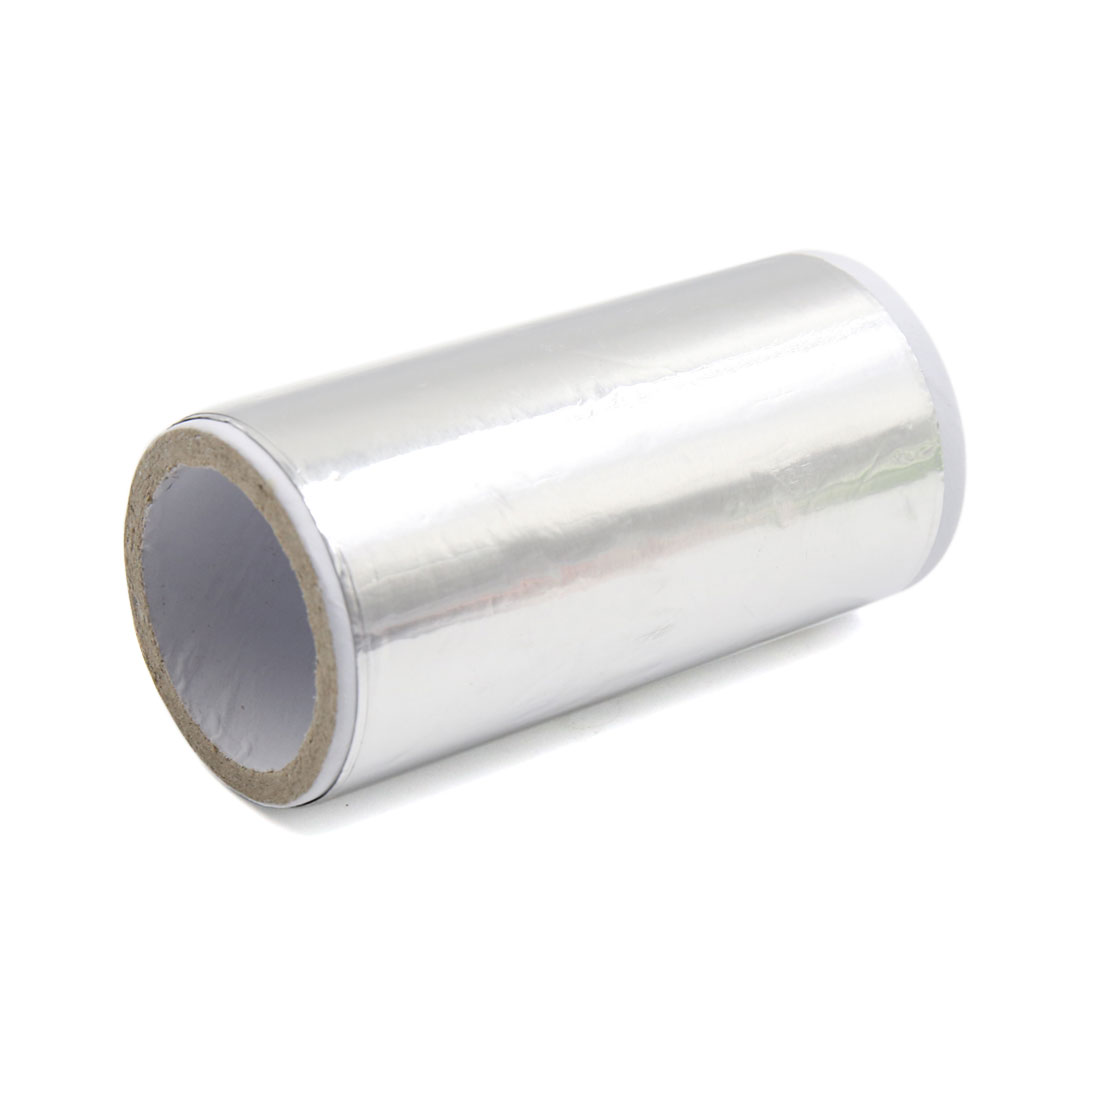 Aluminium Foil Nail Art Soak Off Nails Polish Gel Wrapping Remover